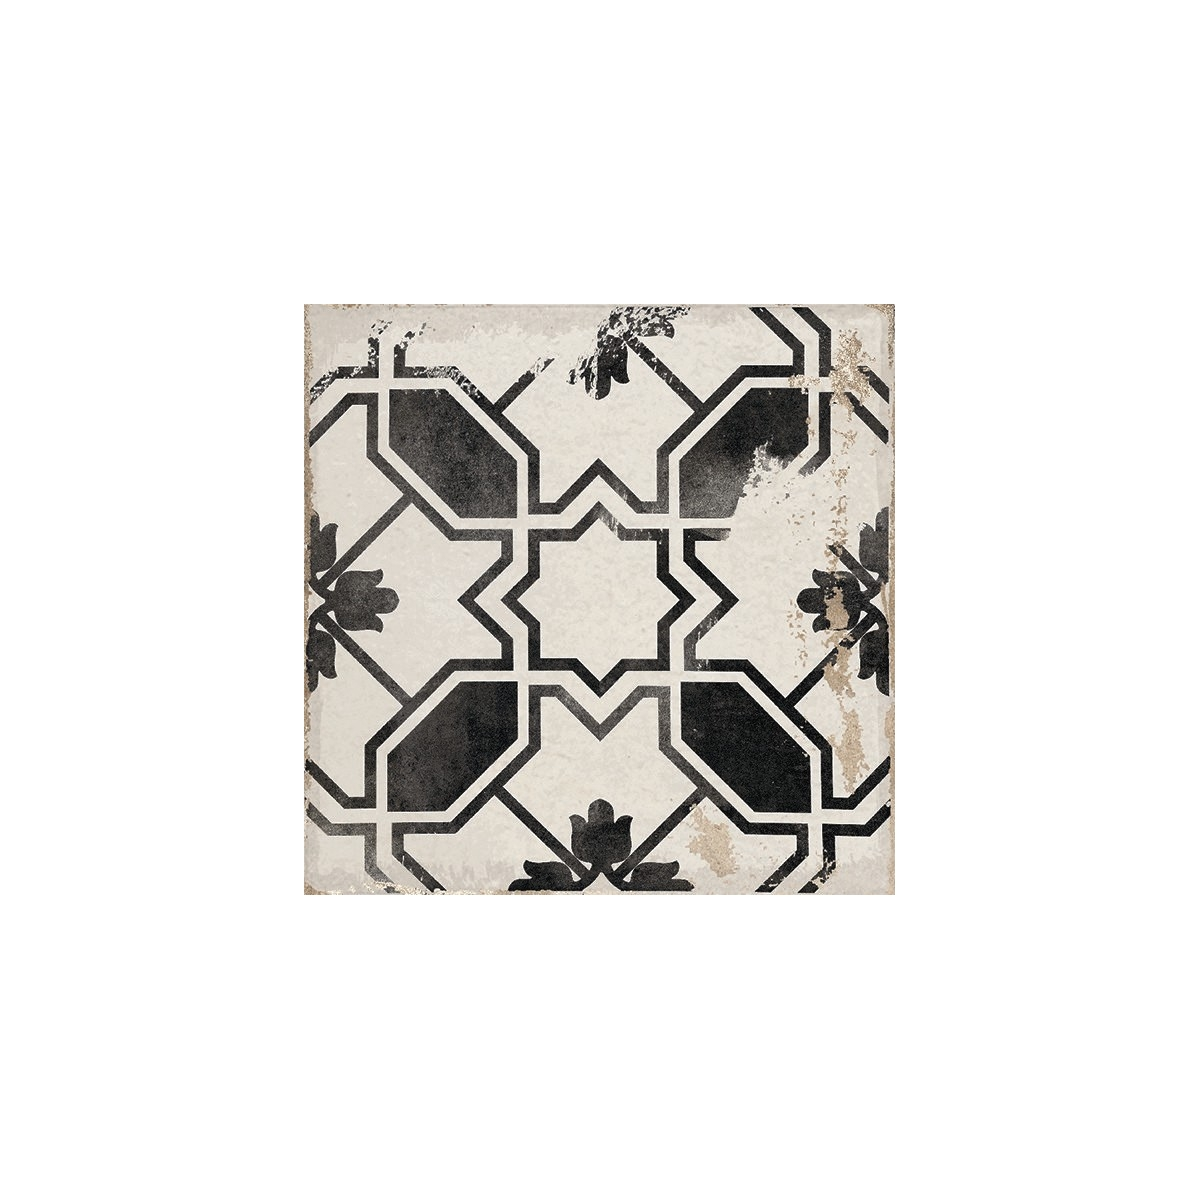 Caleta Black 15x15 (caja 0,5 m2) - Serie Village - Marca APE